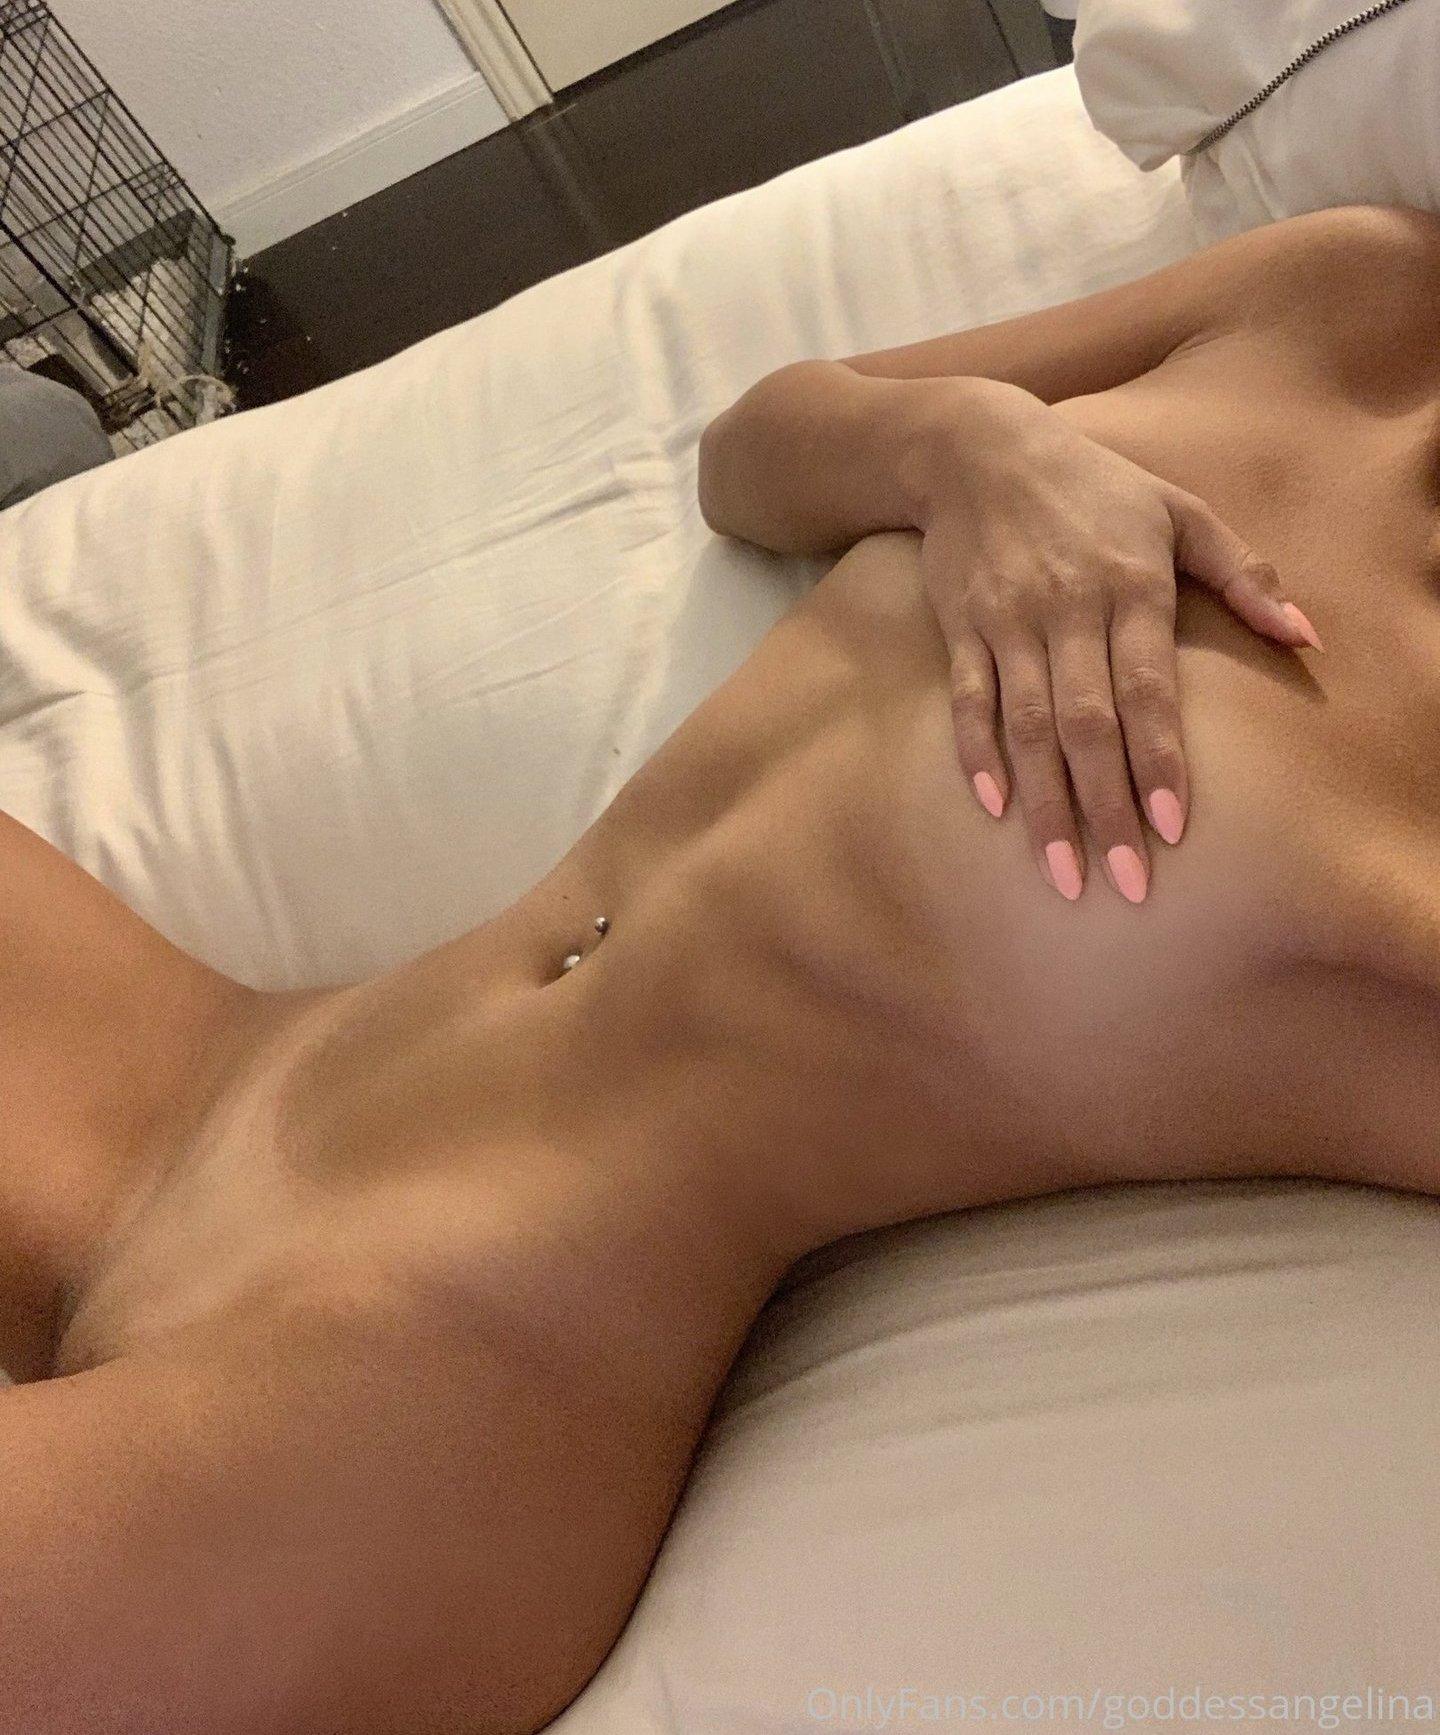 Goddess Angelina Angelina Onlyfans Nude Leaks 0009